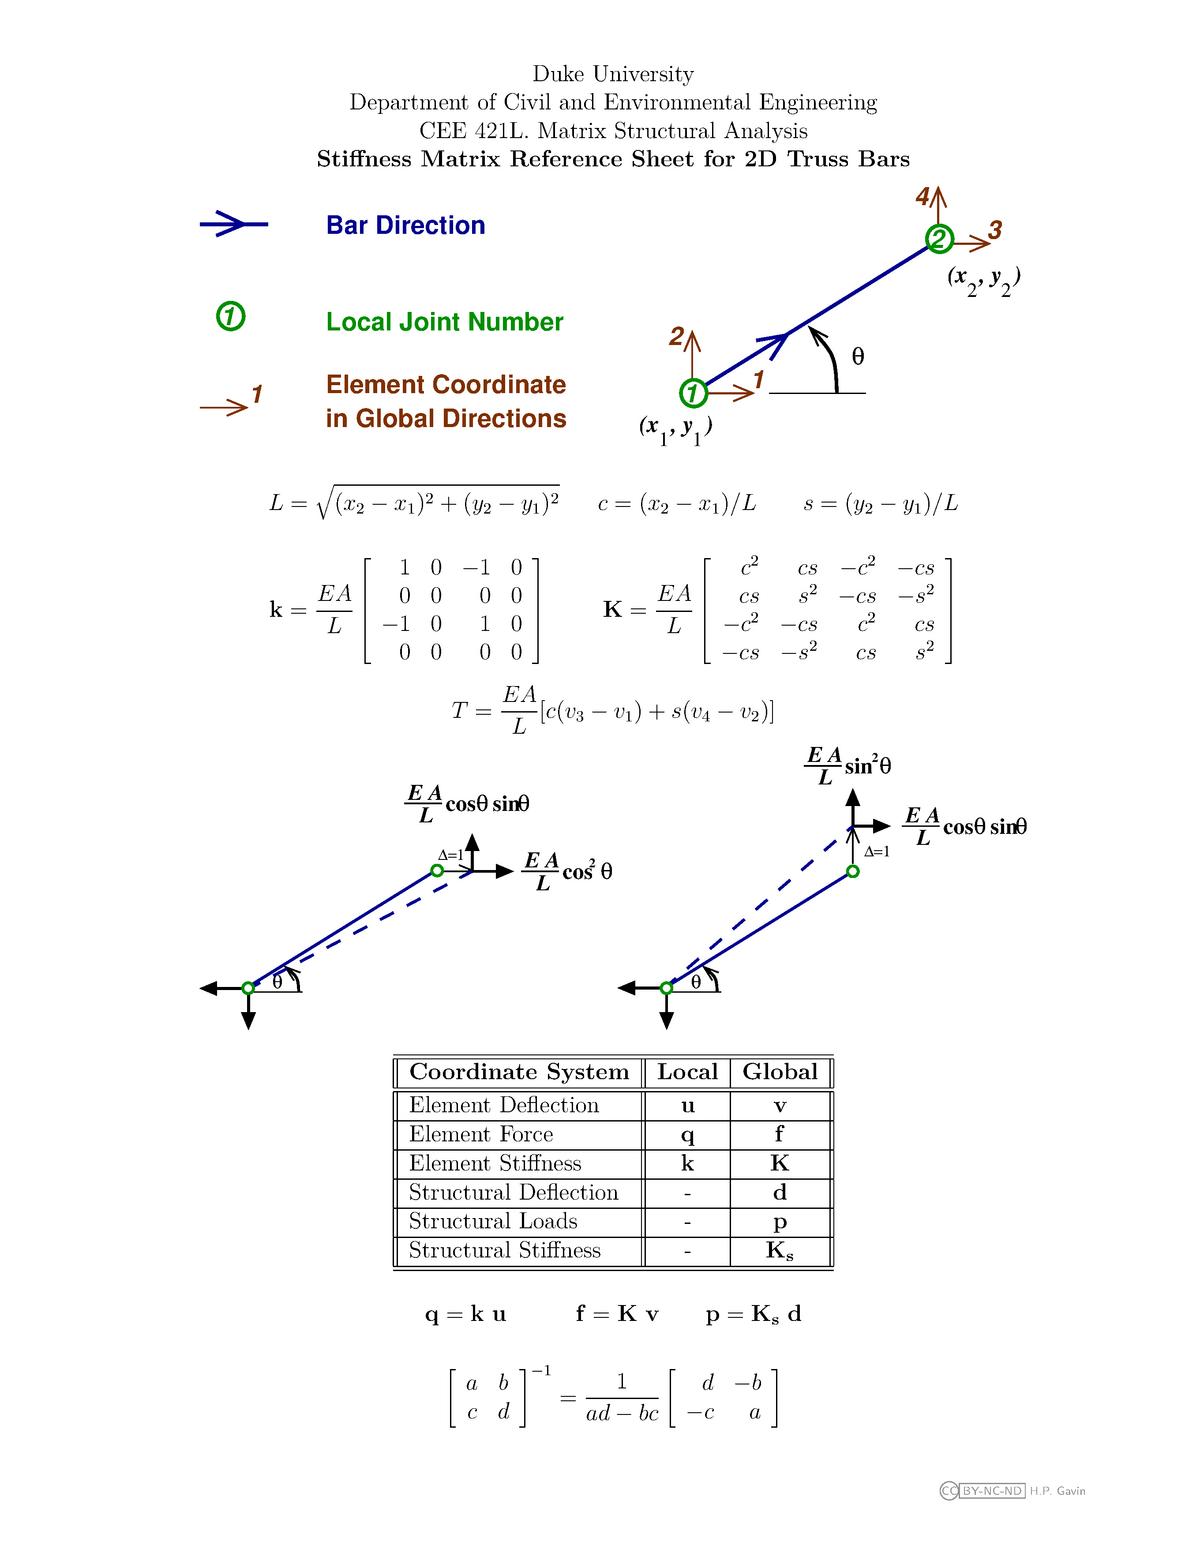 Practical - stiffness matrix reference sheet for 2d truss